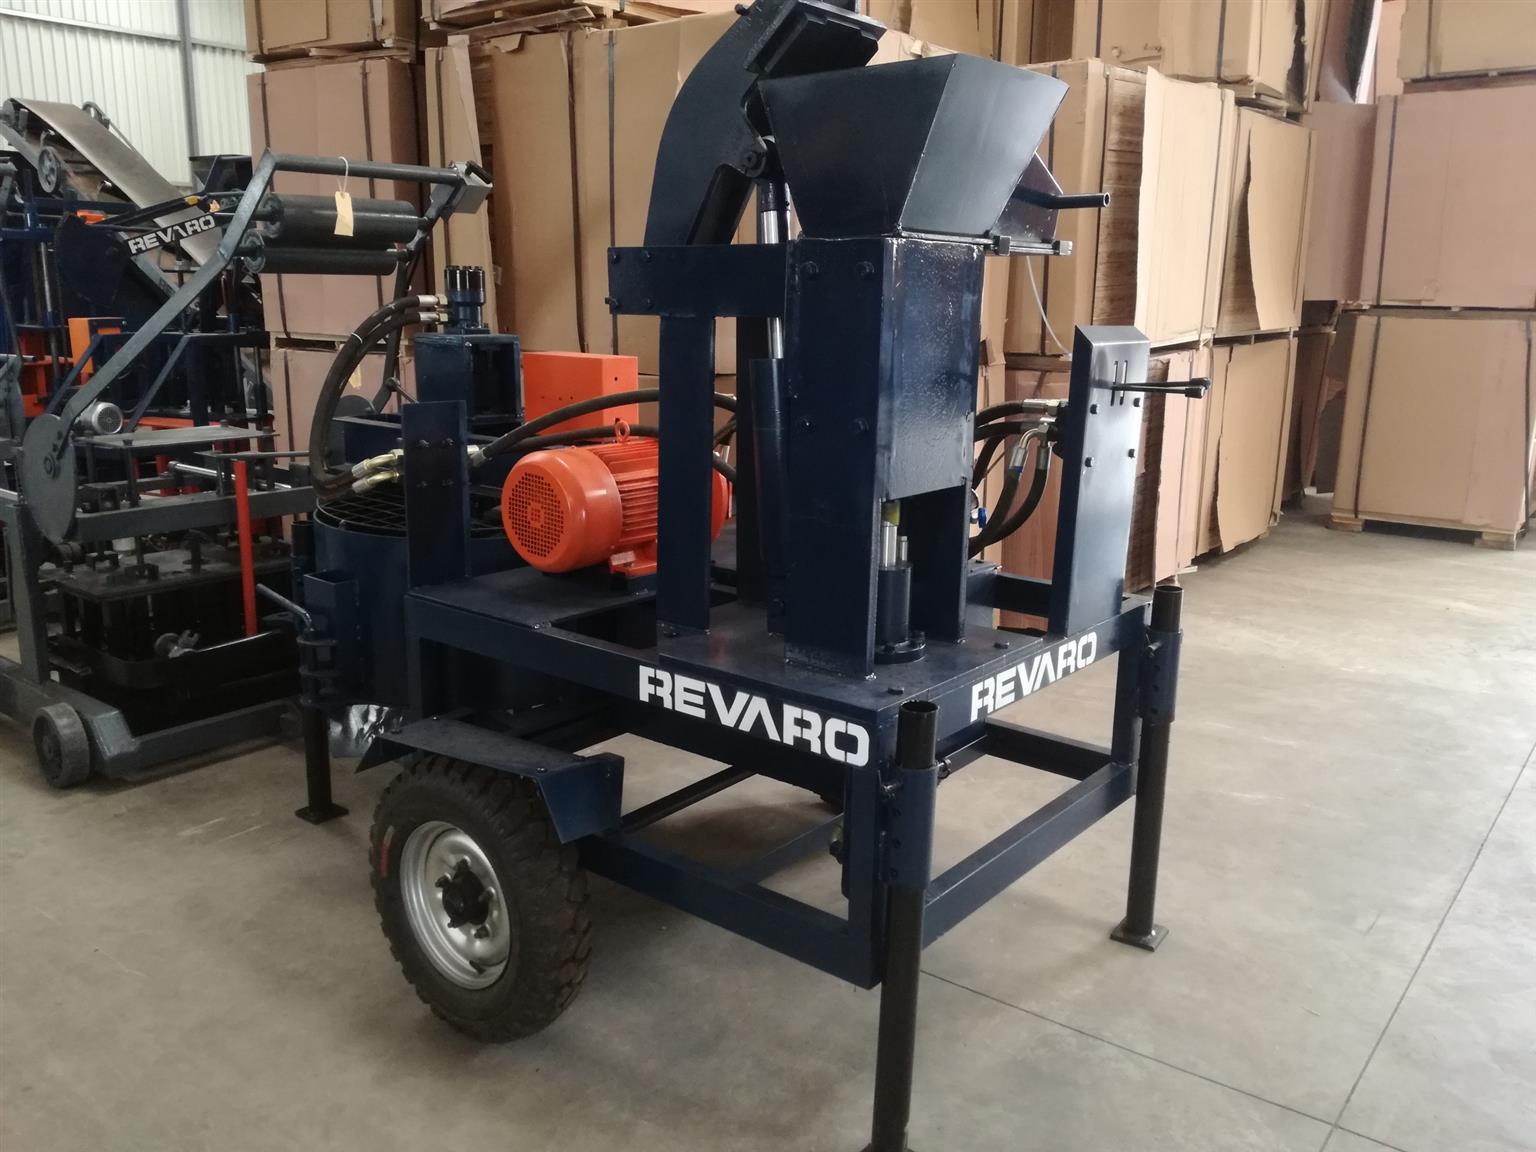 Revaro Hydrablock Mobile Interlocking Block Making Machine